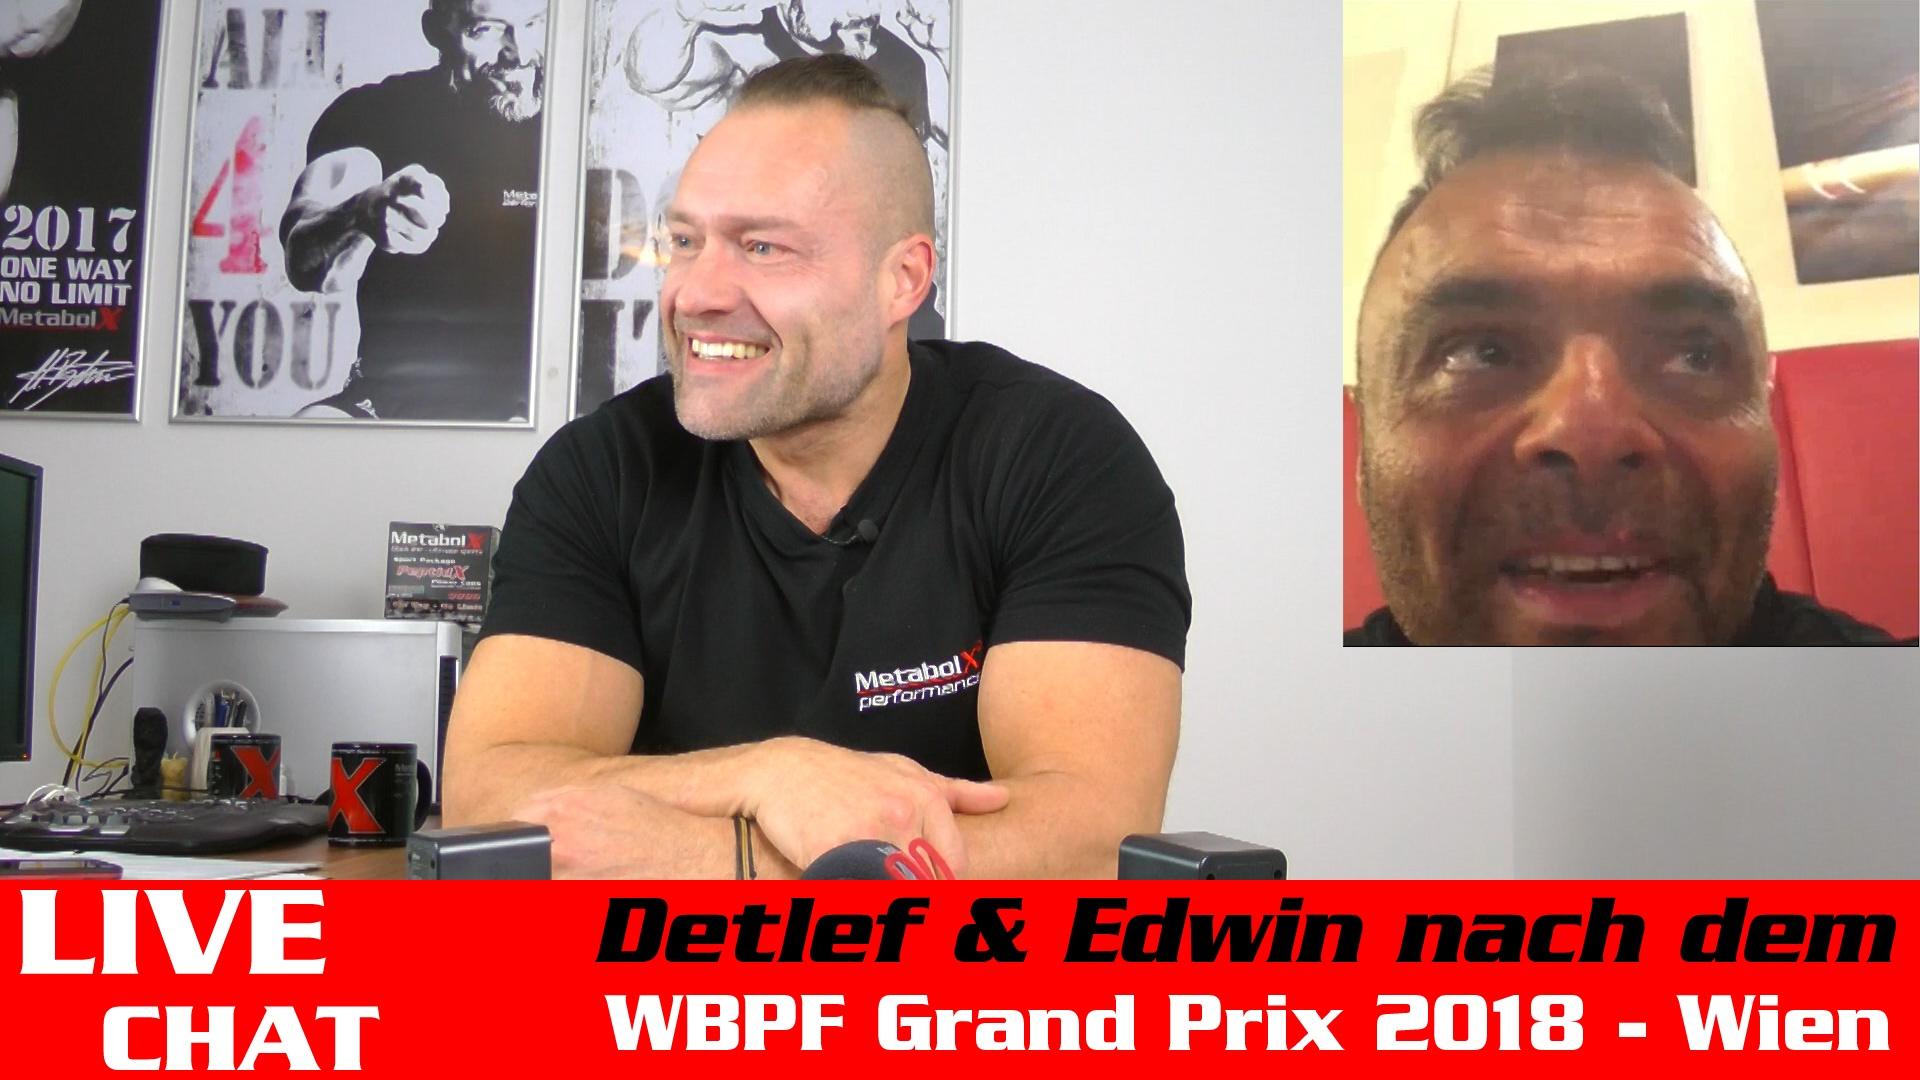 Grandprix Wien 2018 danach